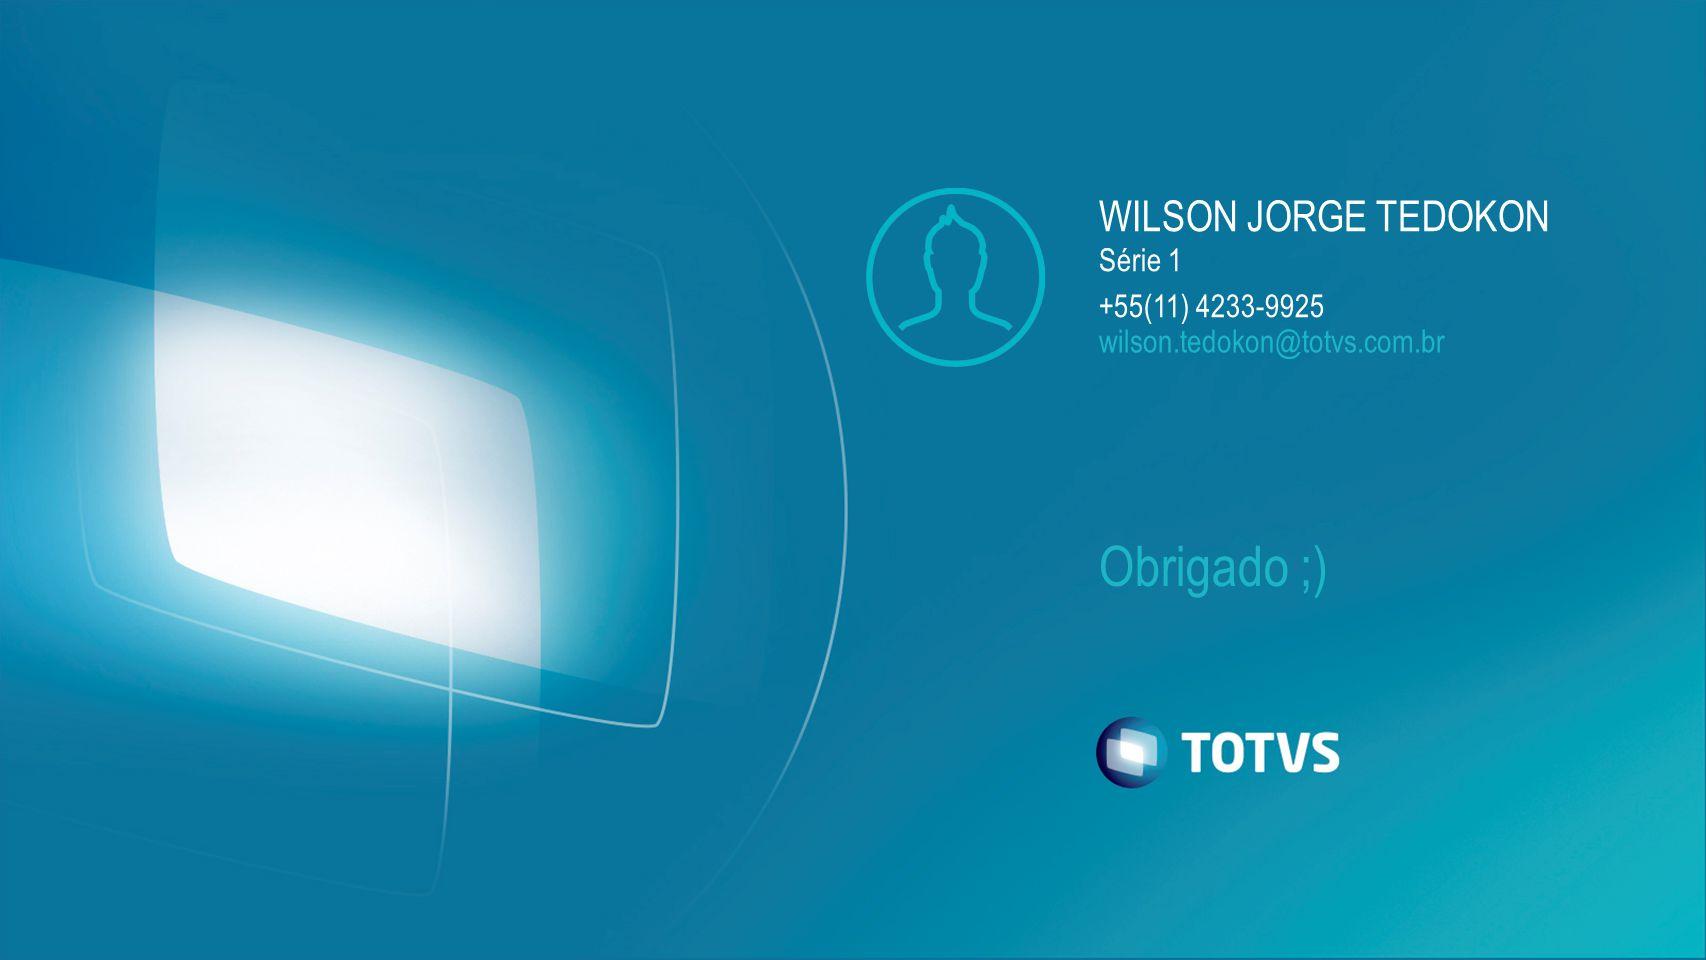 Obrigado ;) WILSON JORGE TEDOKON Série 1 +55(11) 4233-9925 wilson.tedokon@totvs.com.br